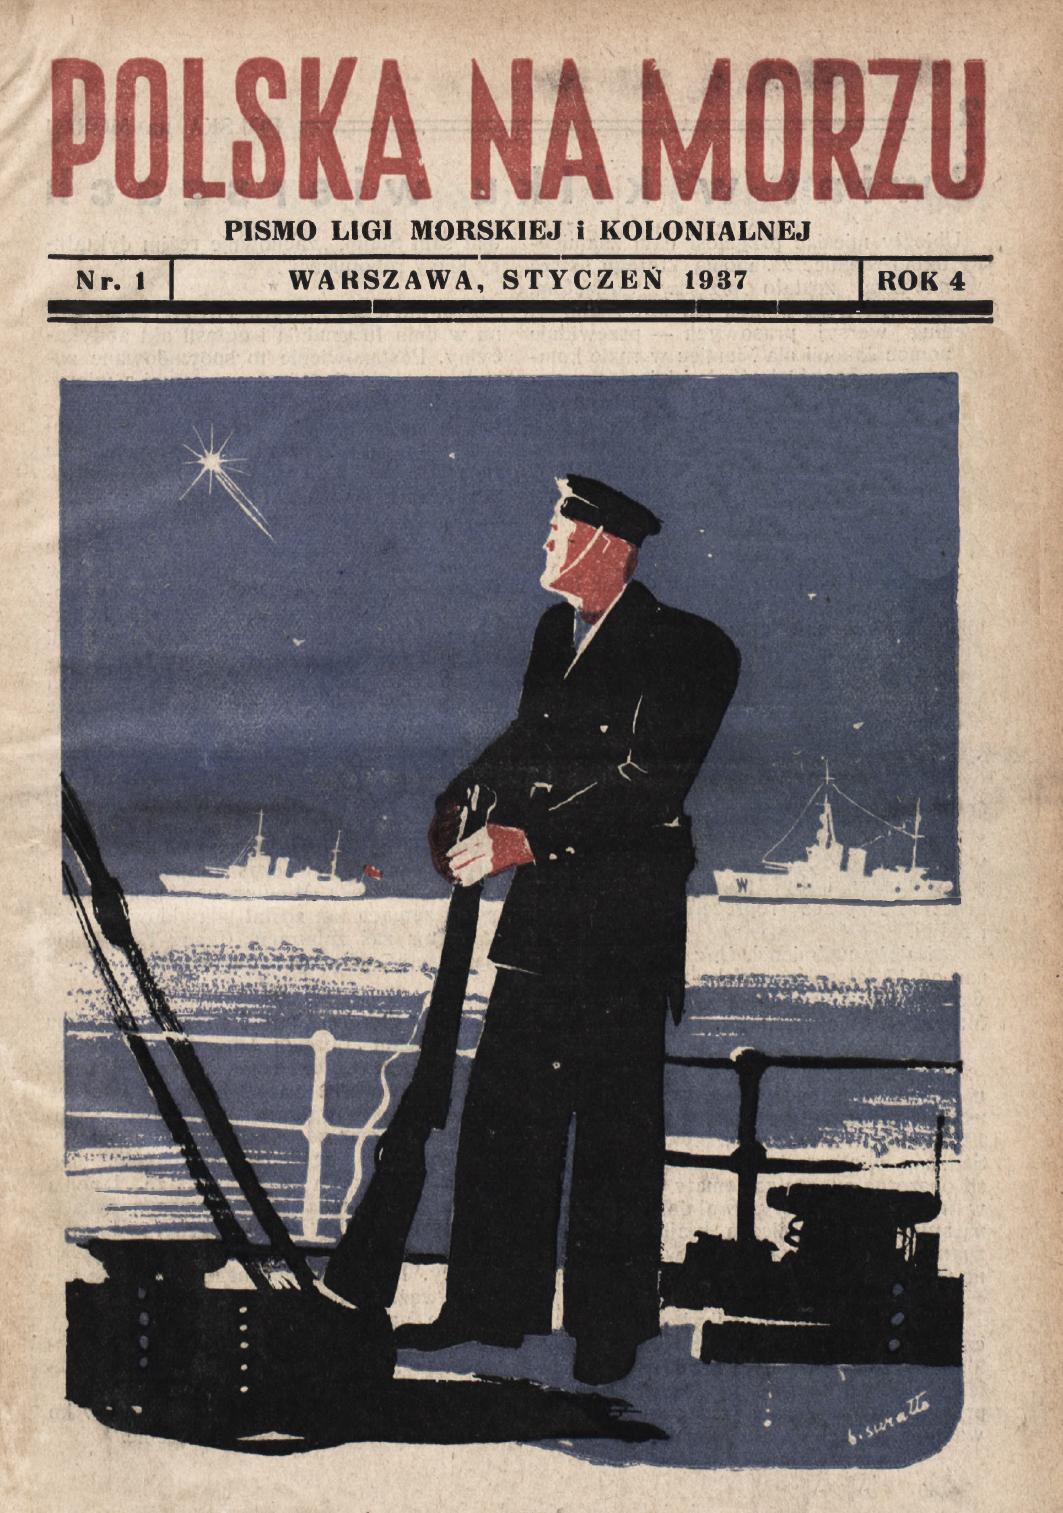 Polska na Morzu : pismo Ligi Morskiej i Kolonjalnej. - Liga Morska i Kolonjalna, 1937, nr 1